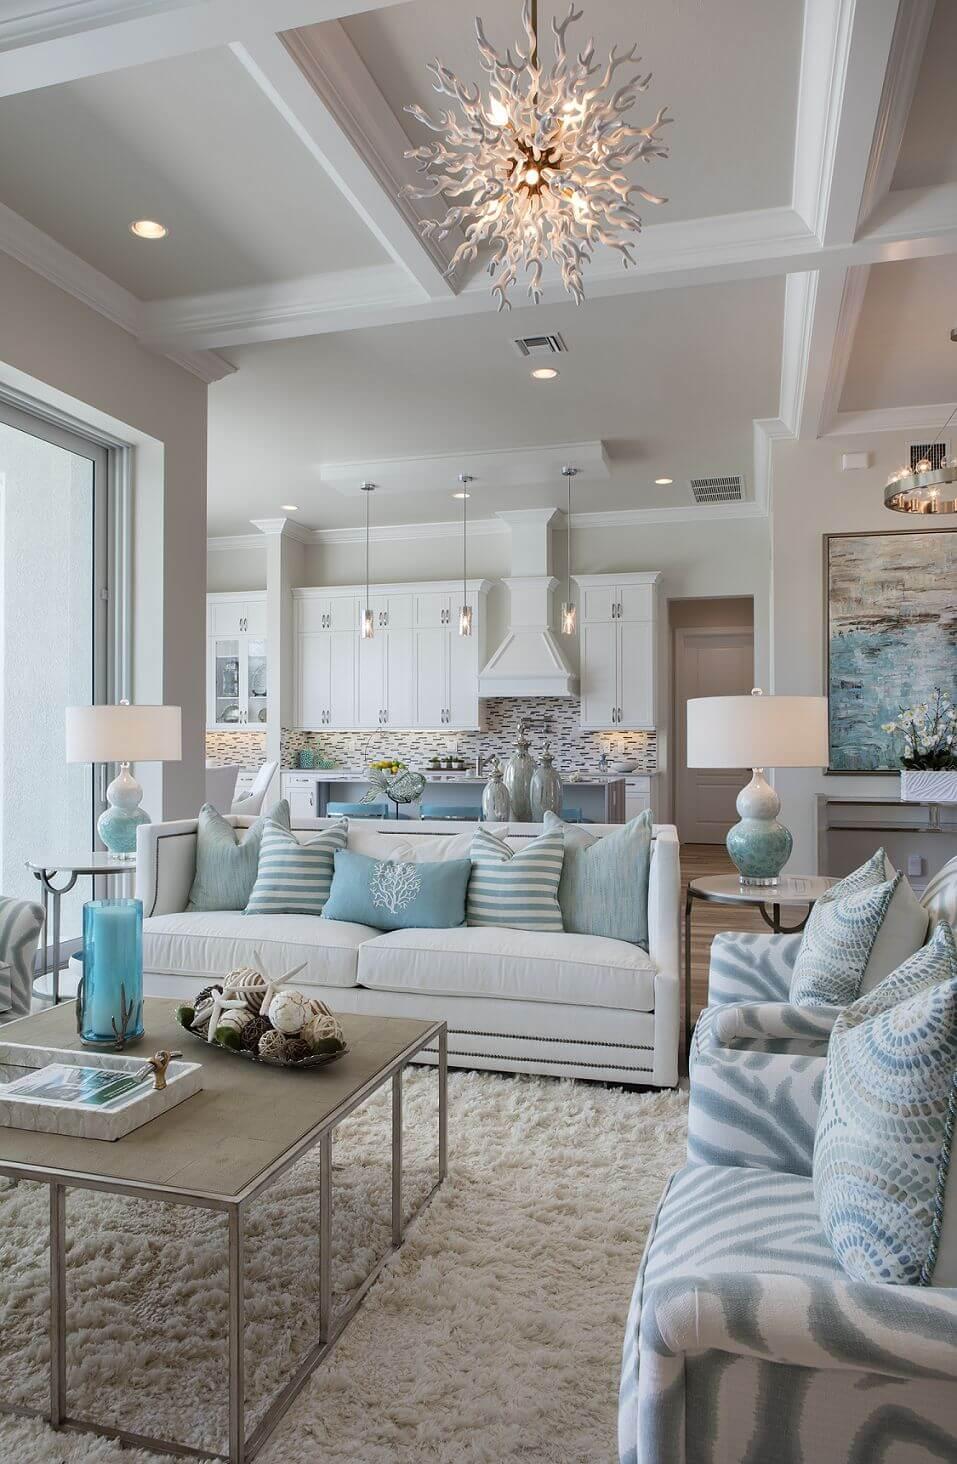 32 Best Beach House Interior Design Ideas and Decorations ... on House Interior Ideas  id=47740